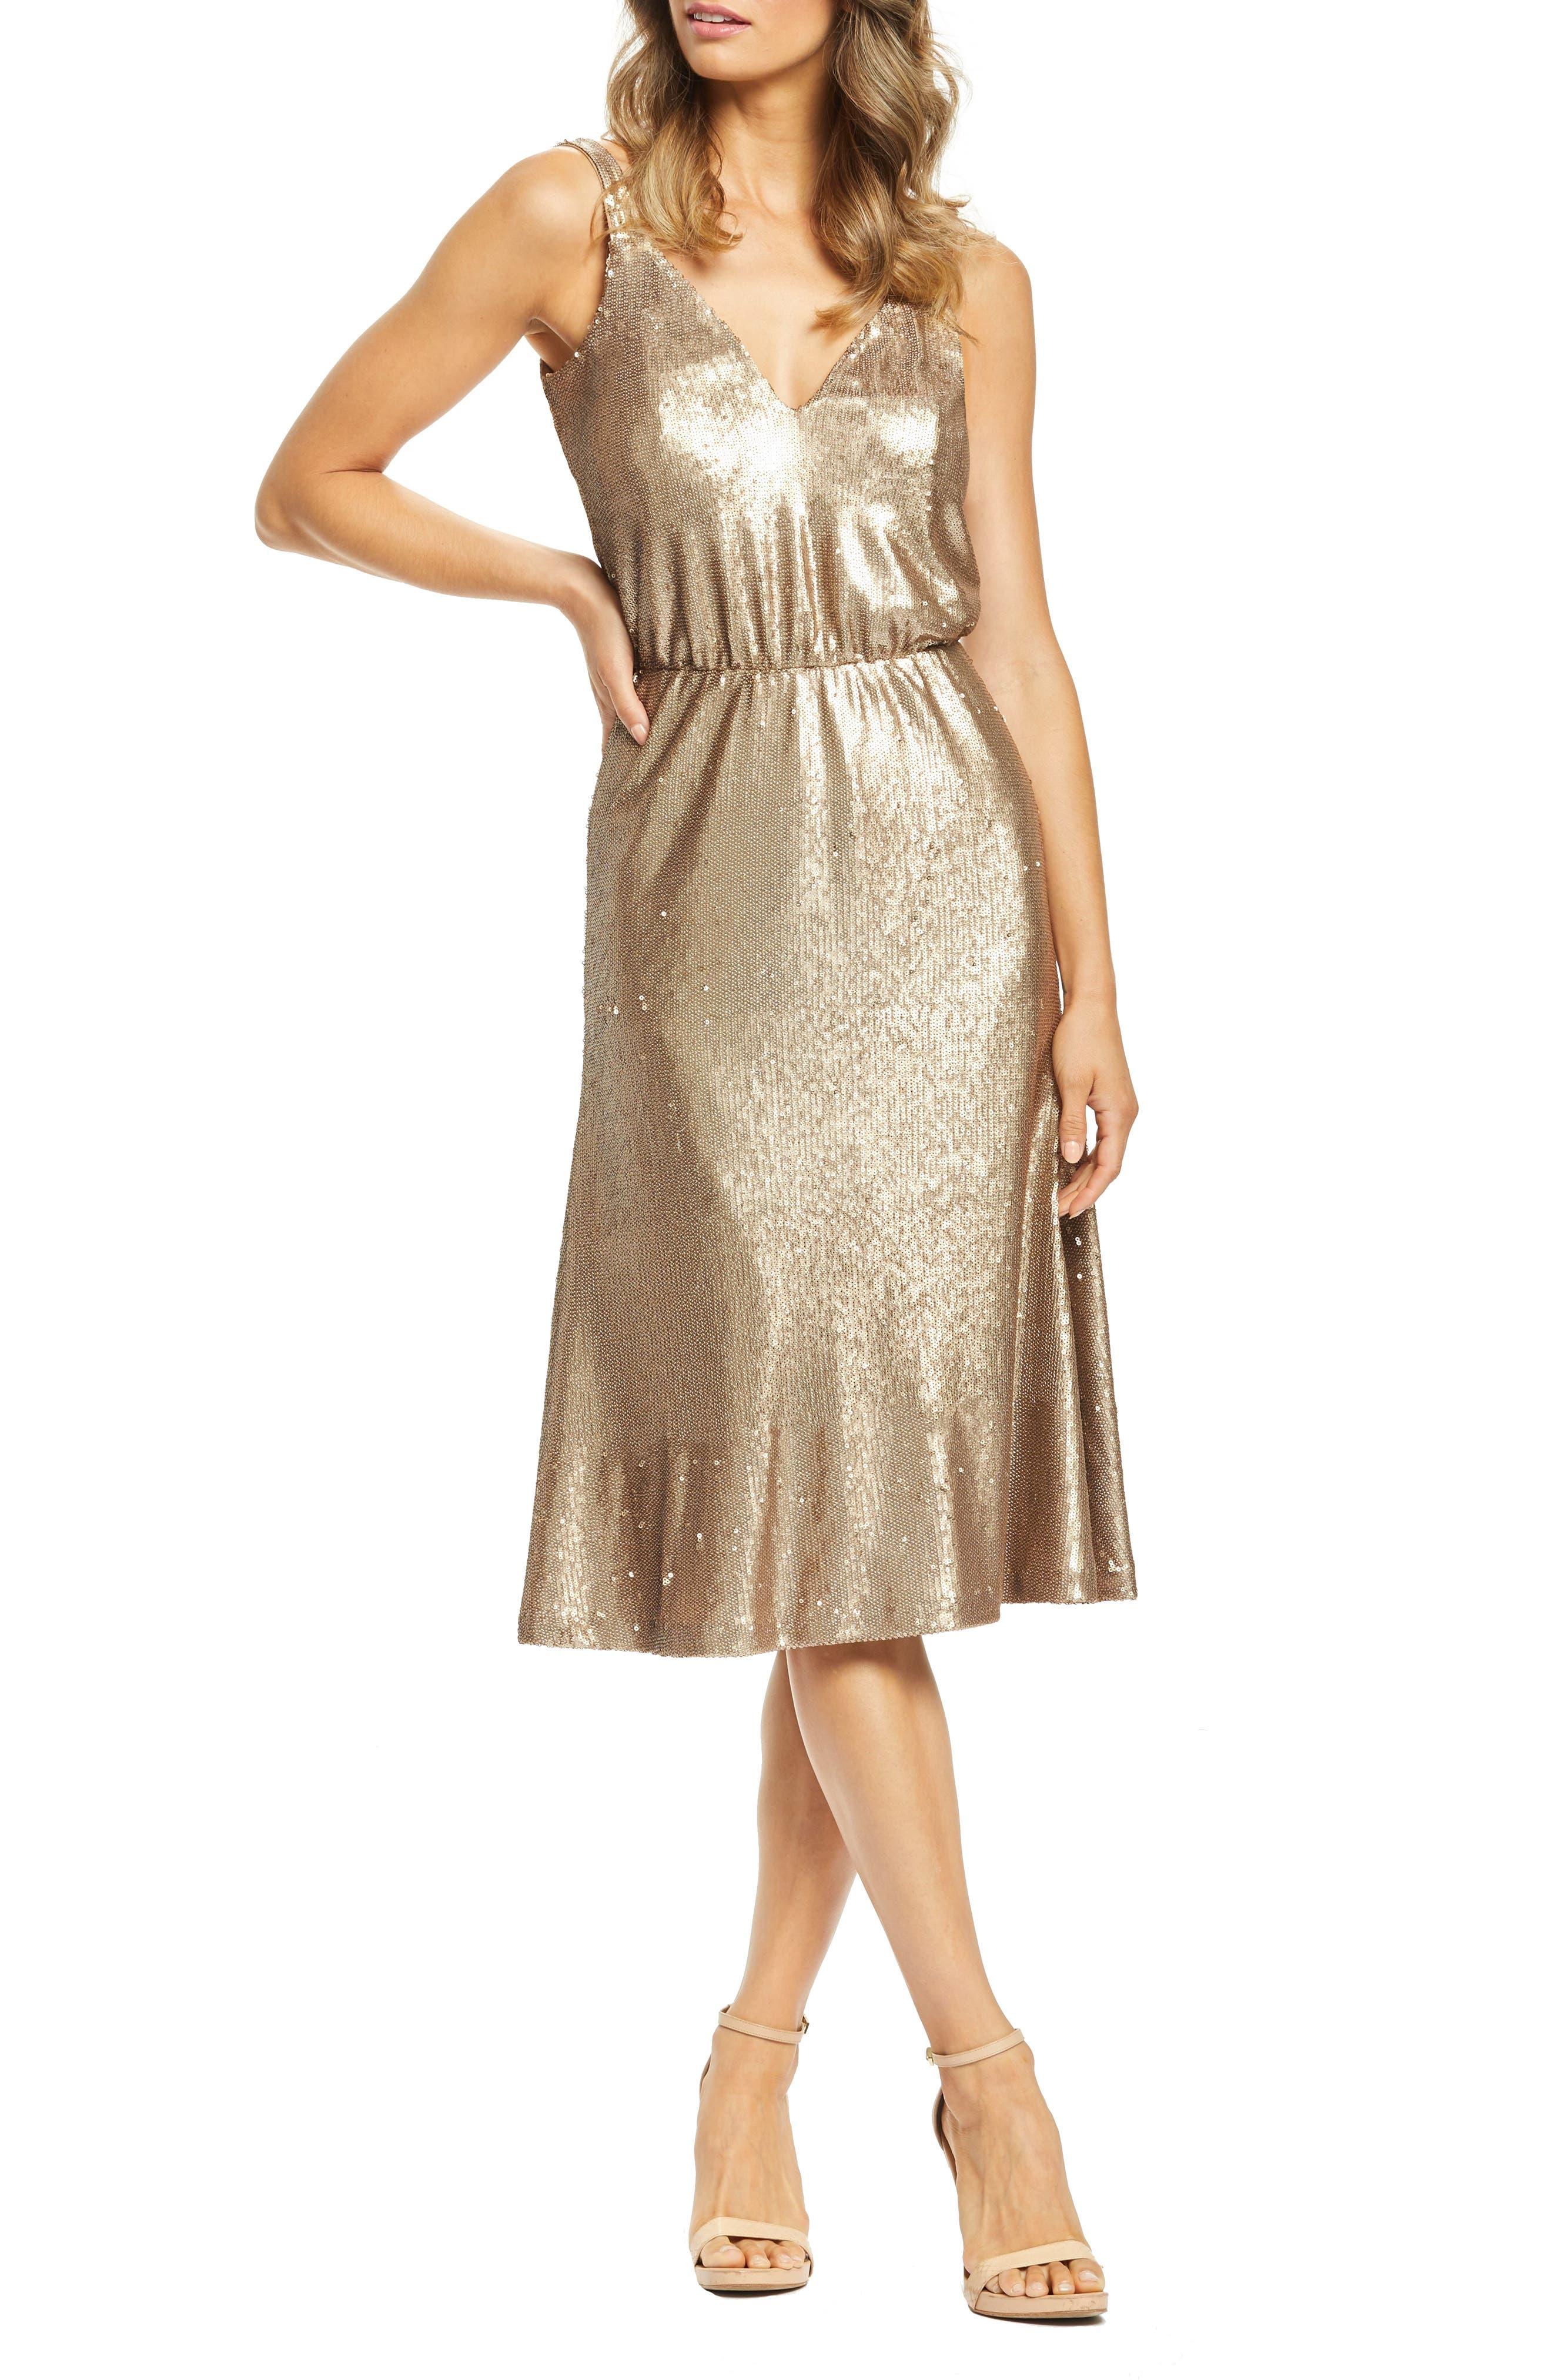 70s Prom, Formal, Evening, Party Dresses Womens Dress The Population Cameron Sequin Blouson Dress Size XX-Large - Metallic $148.80 AT vintagedancer.com